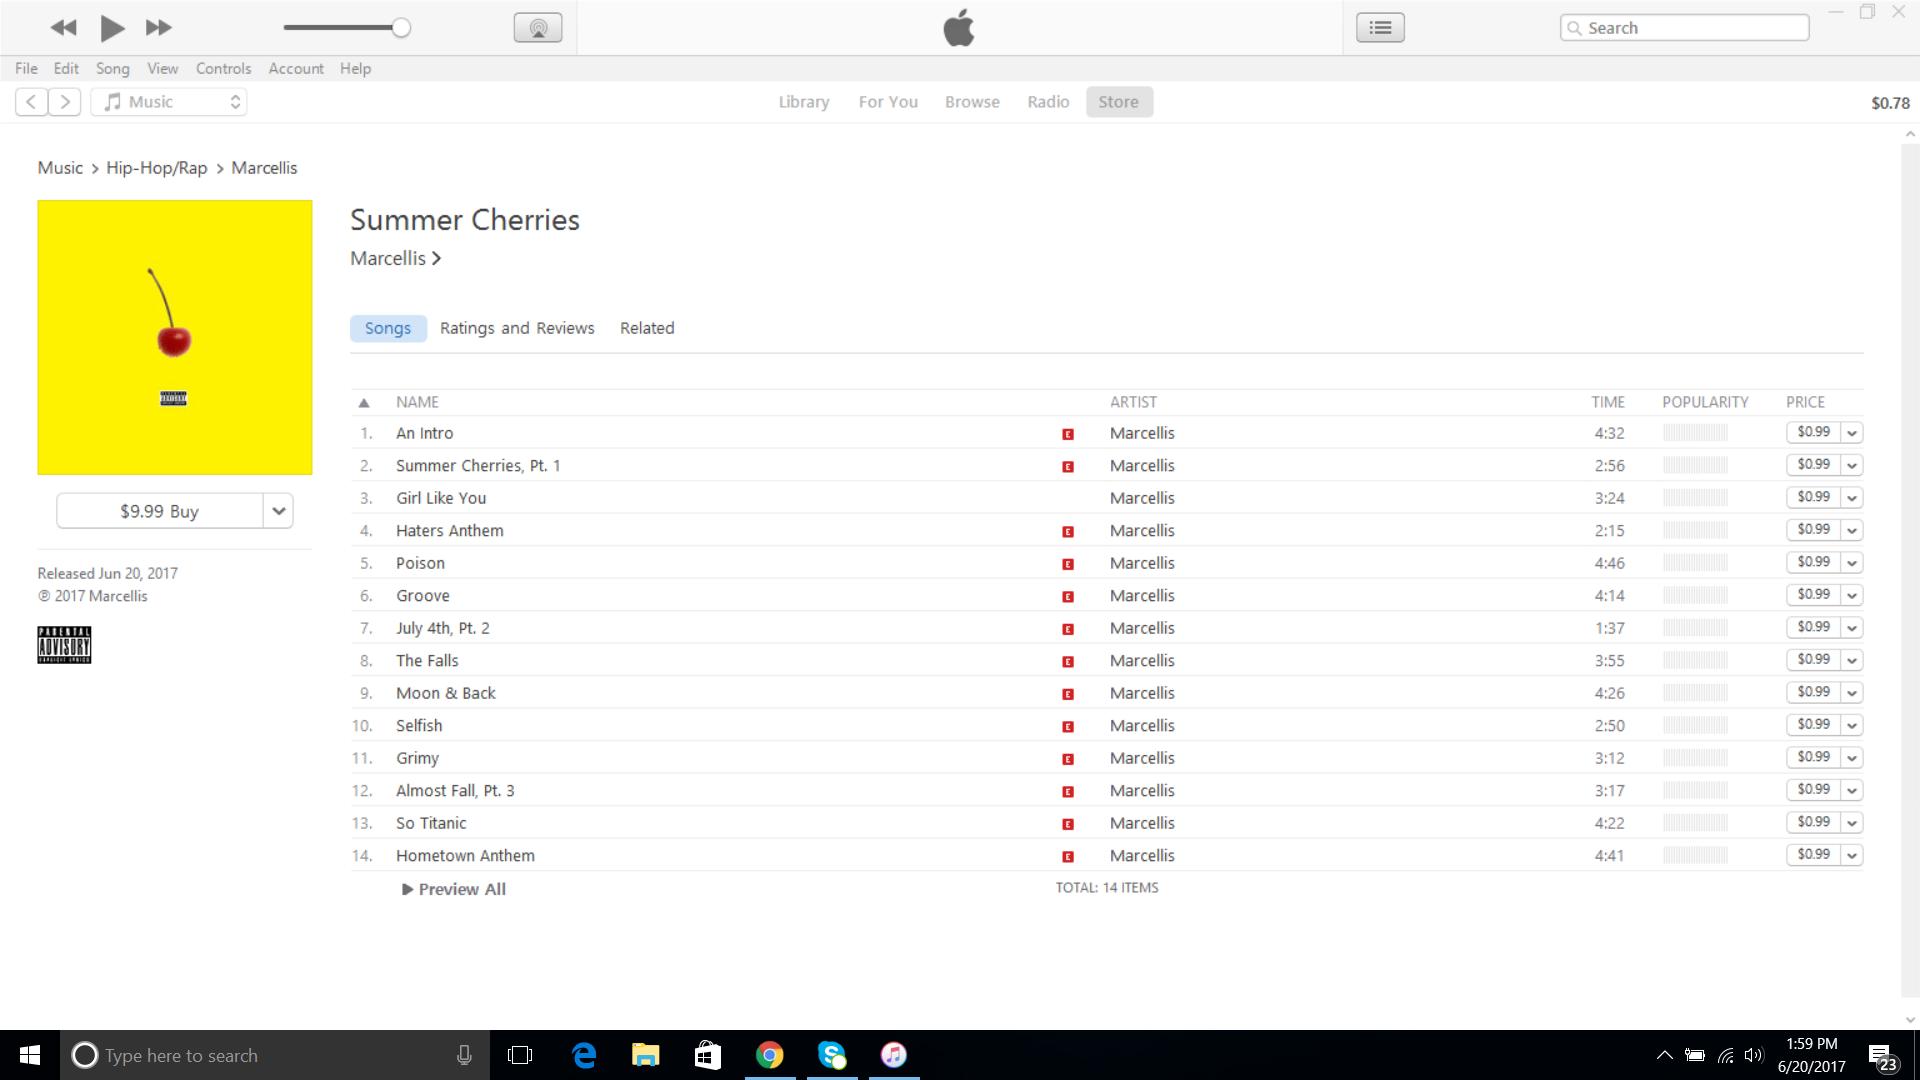 Summer Cherries iTunes Picture.png